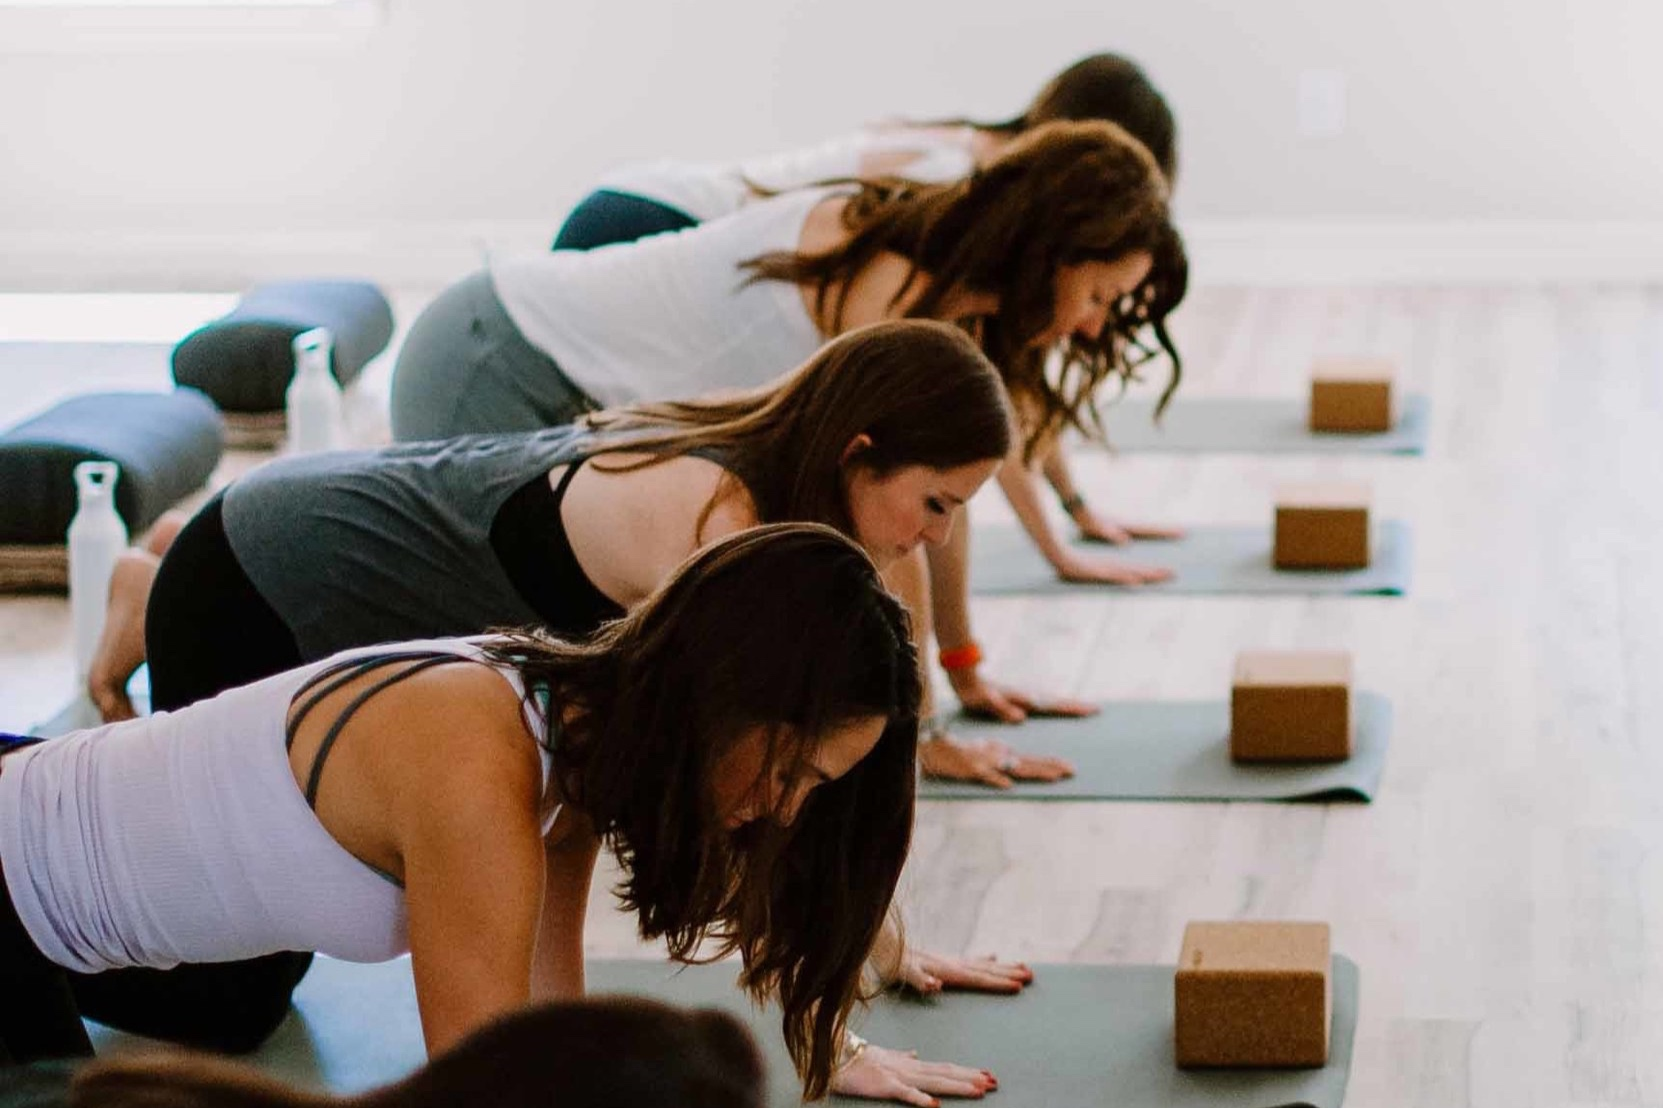 Open+Studio+Pilates+Classes+at+The+Breathing+Room+I+women+doing+pushups